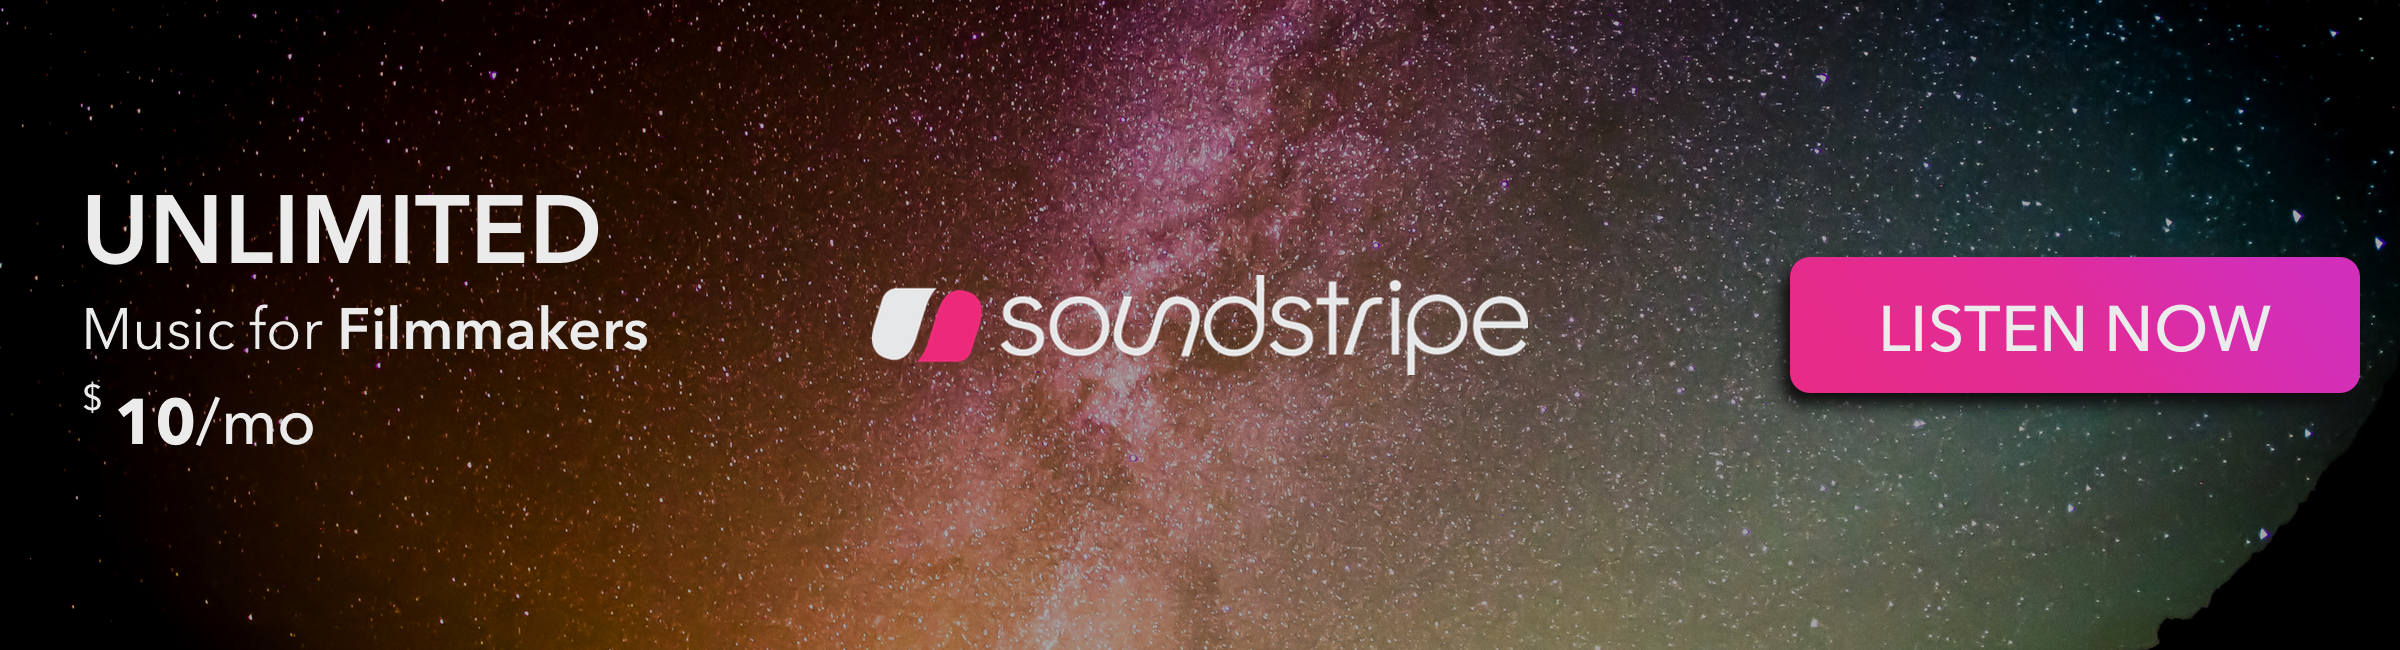 Soundstripe Horizontal Banner Ad.png